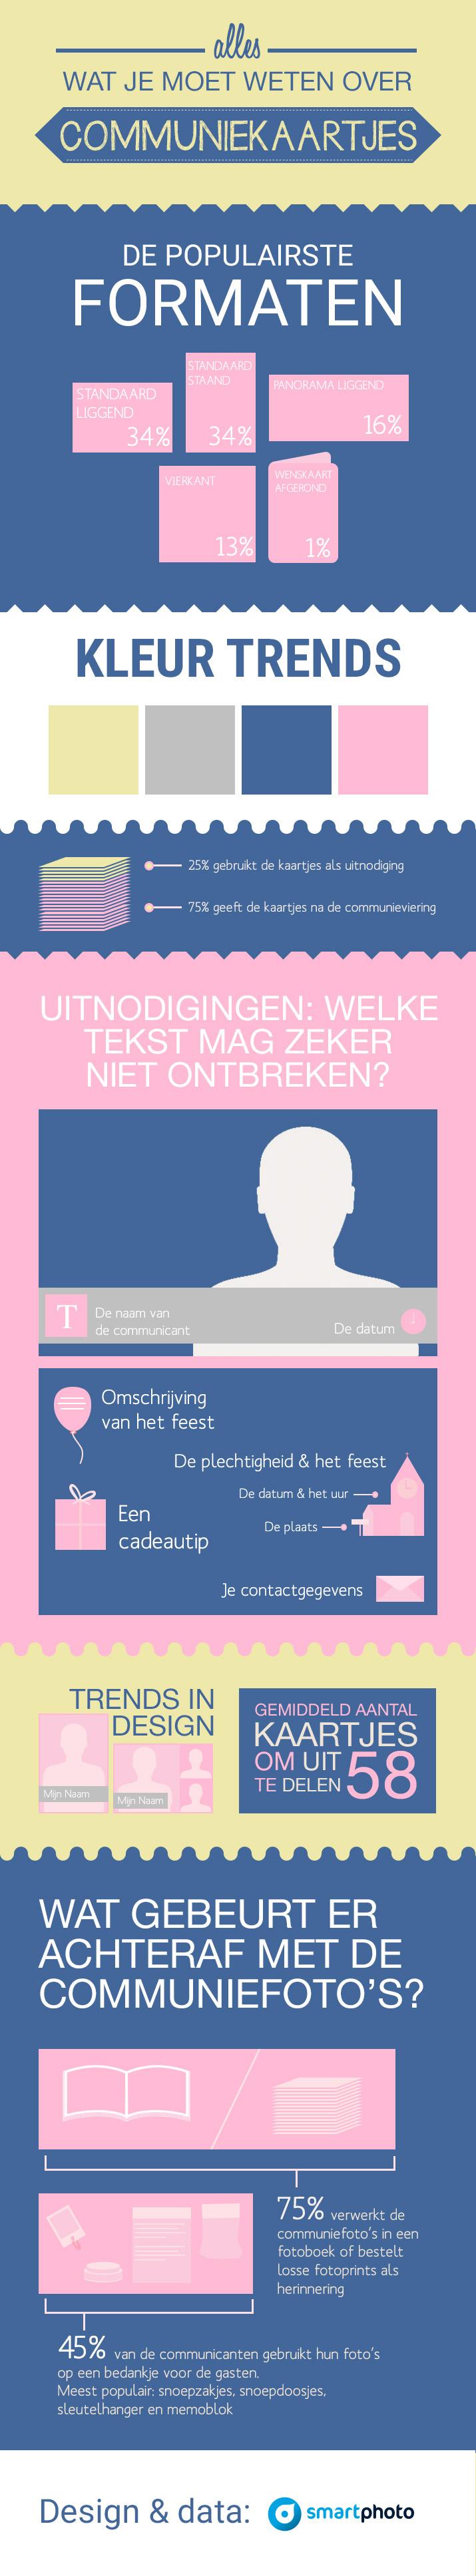 infographic communie